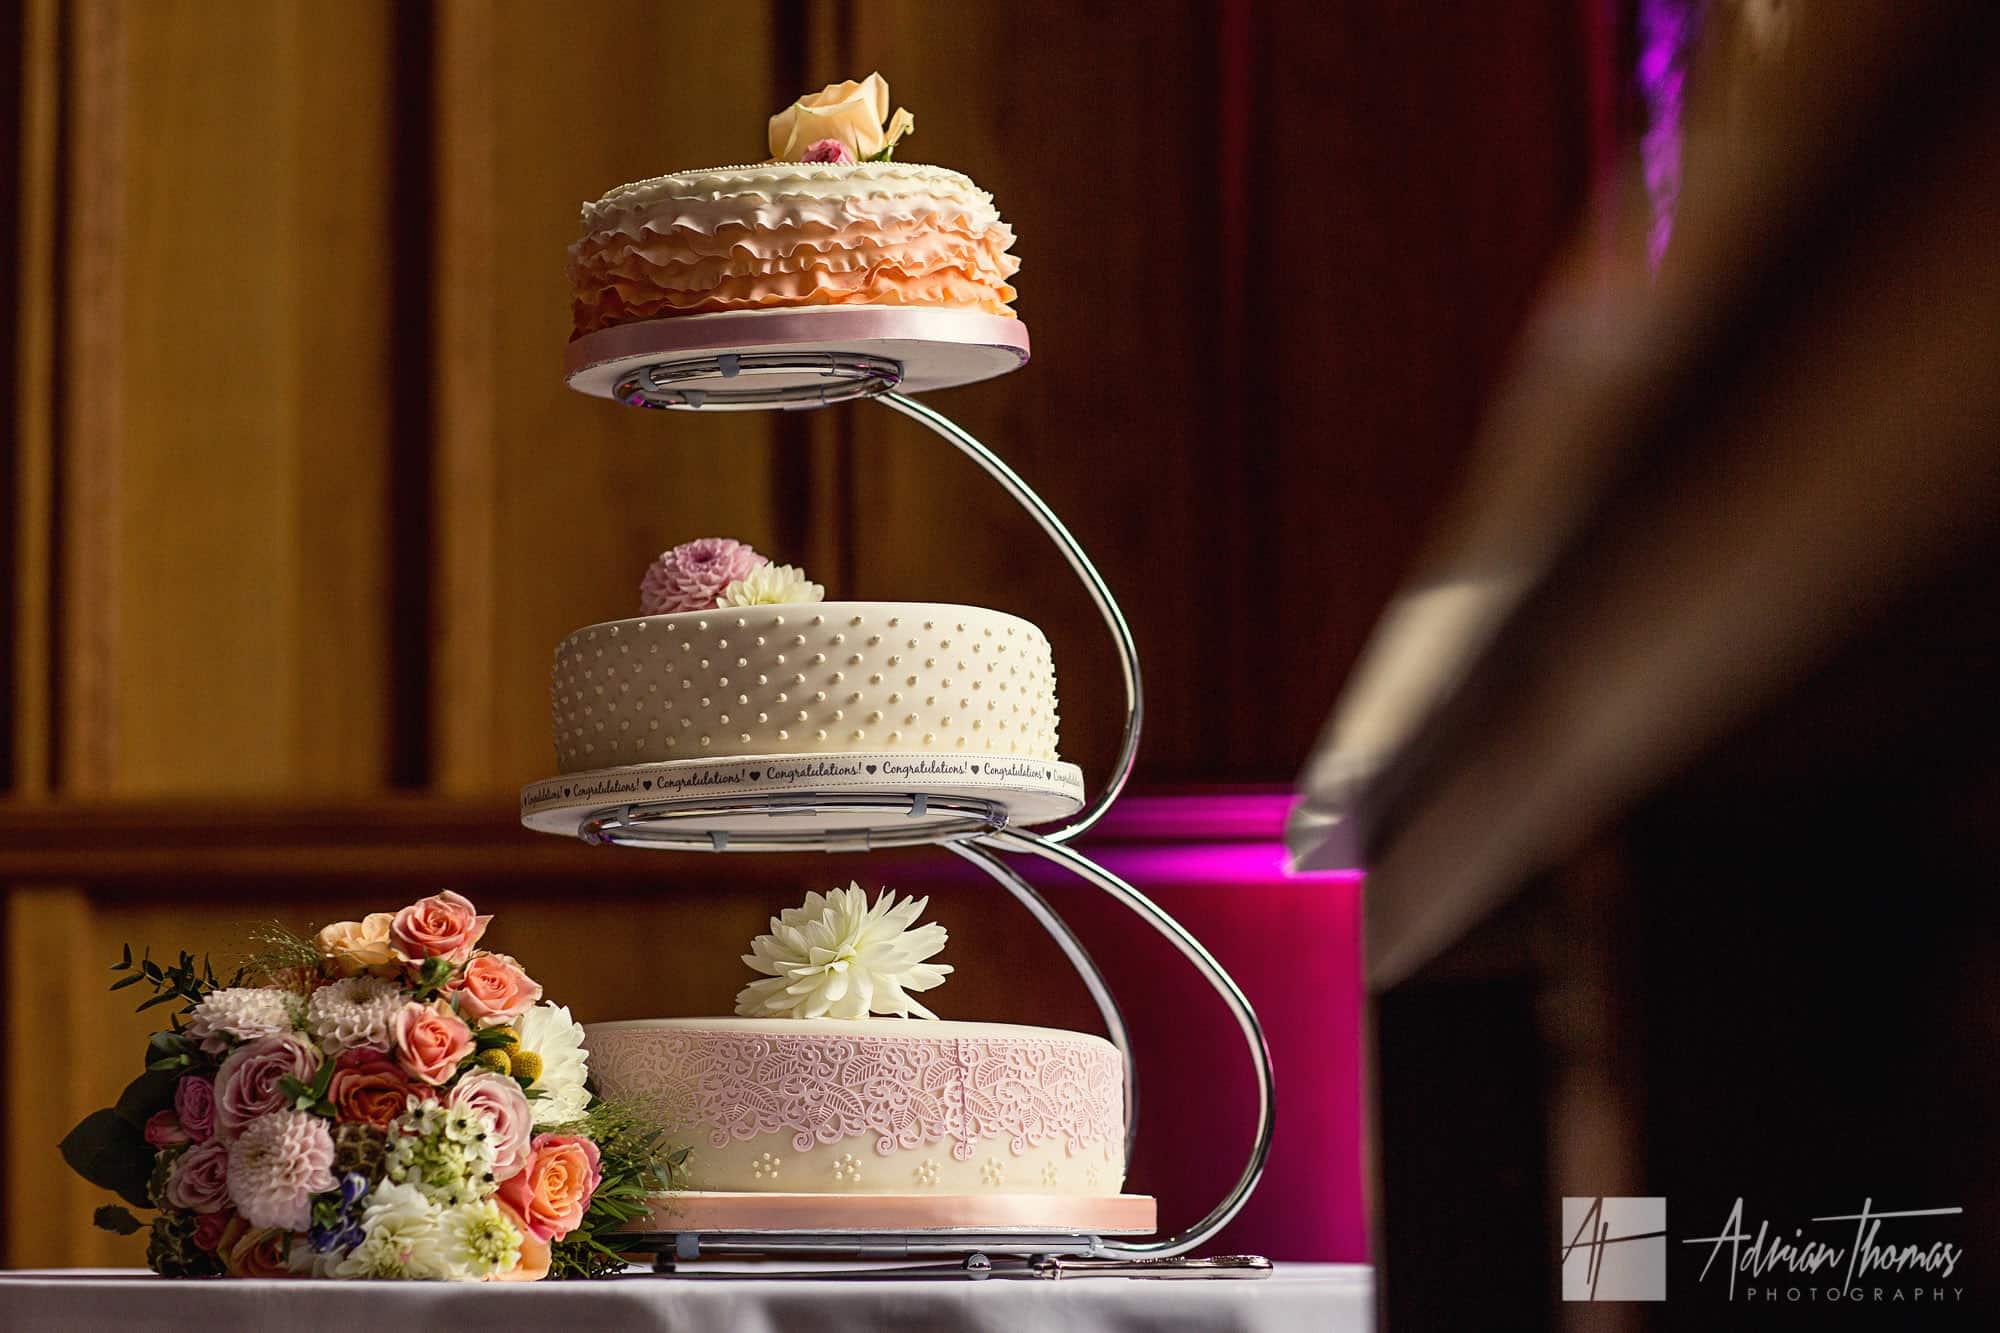 Wedding cake at Caerphilly Castle.